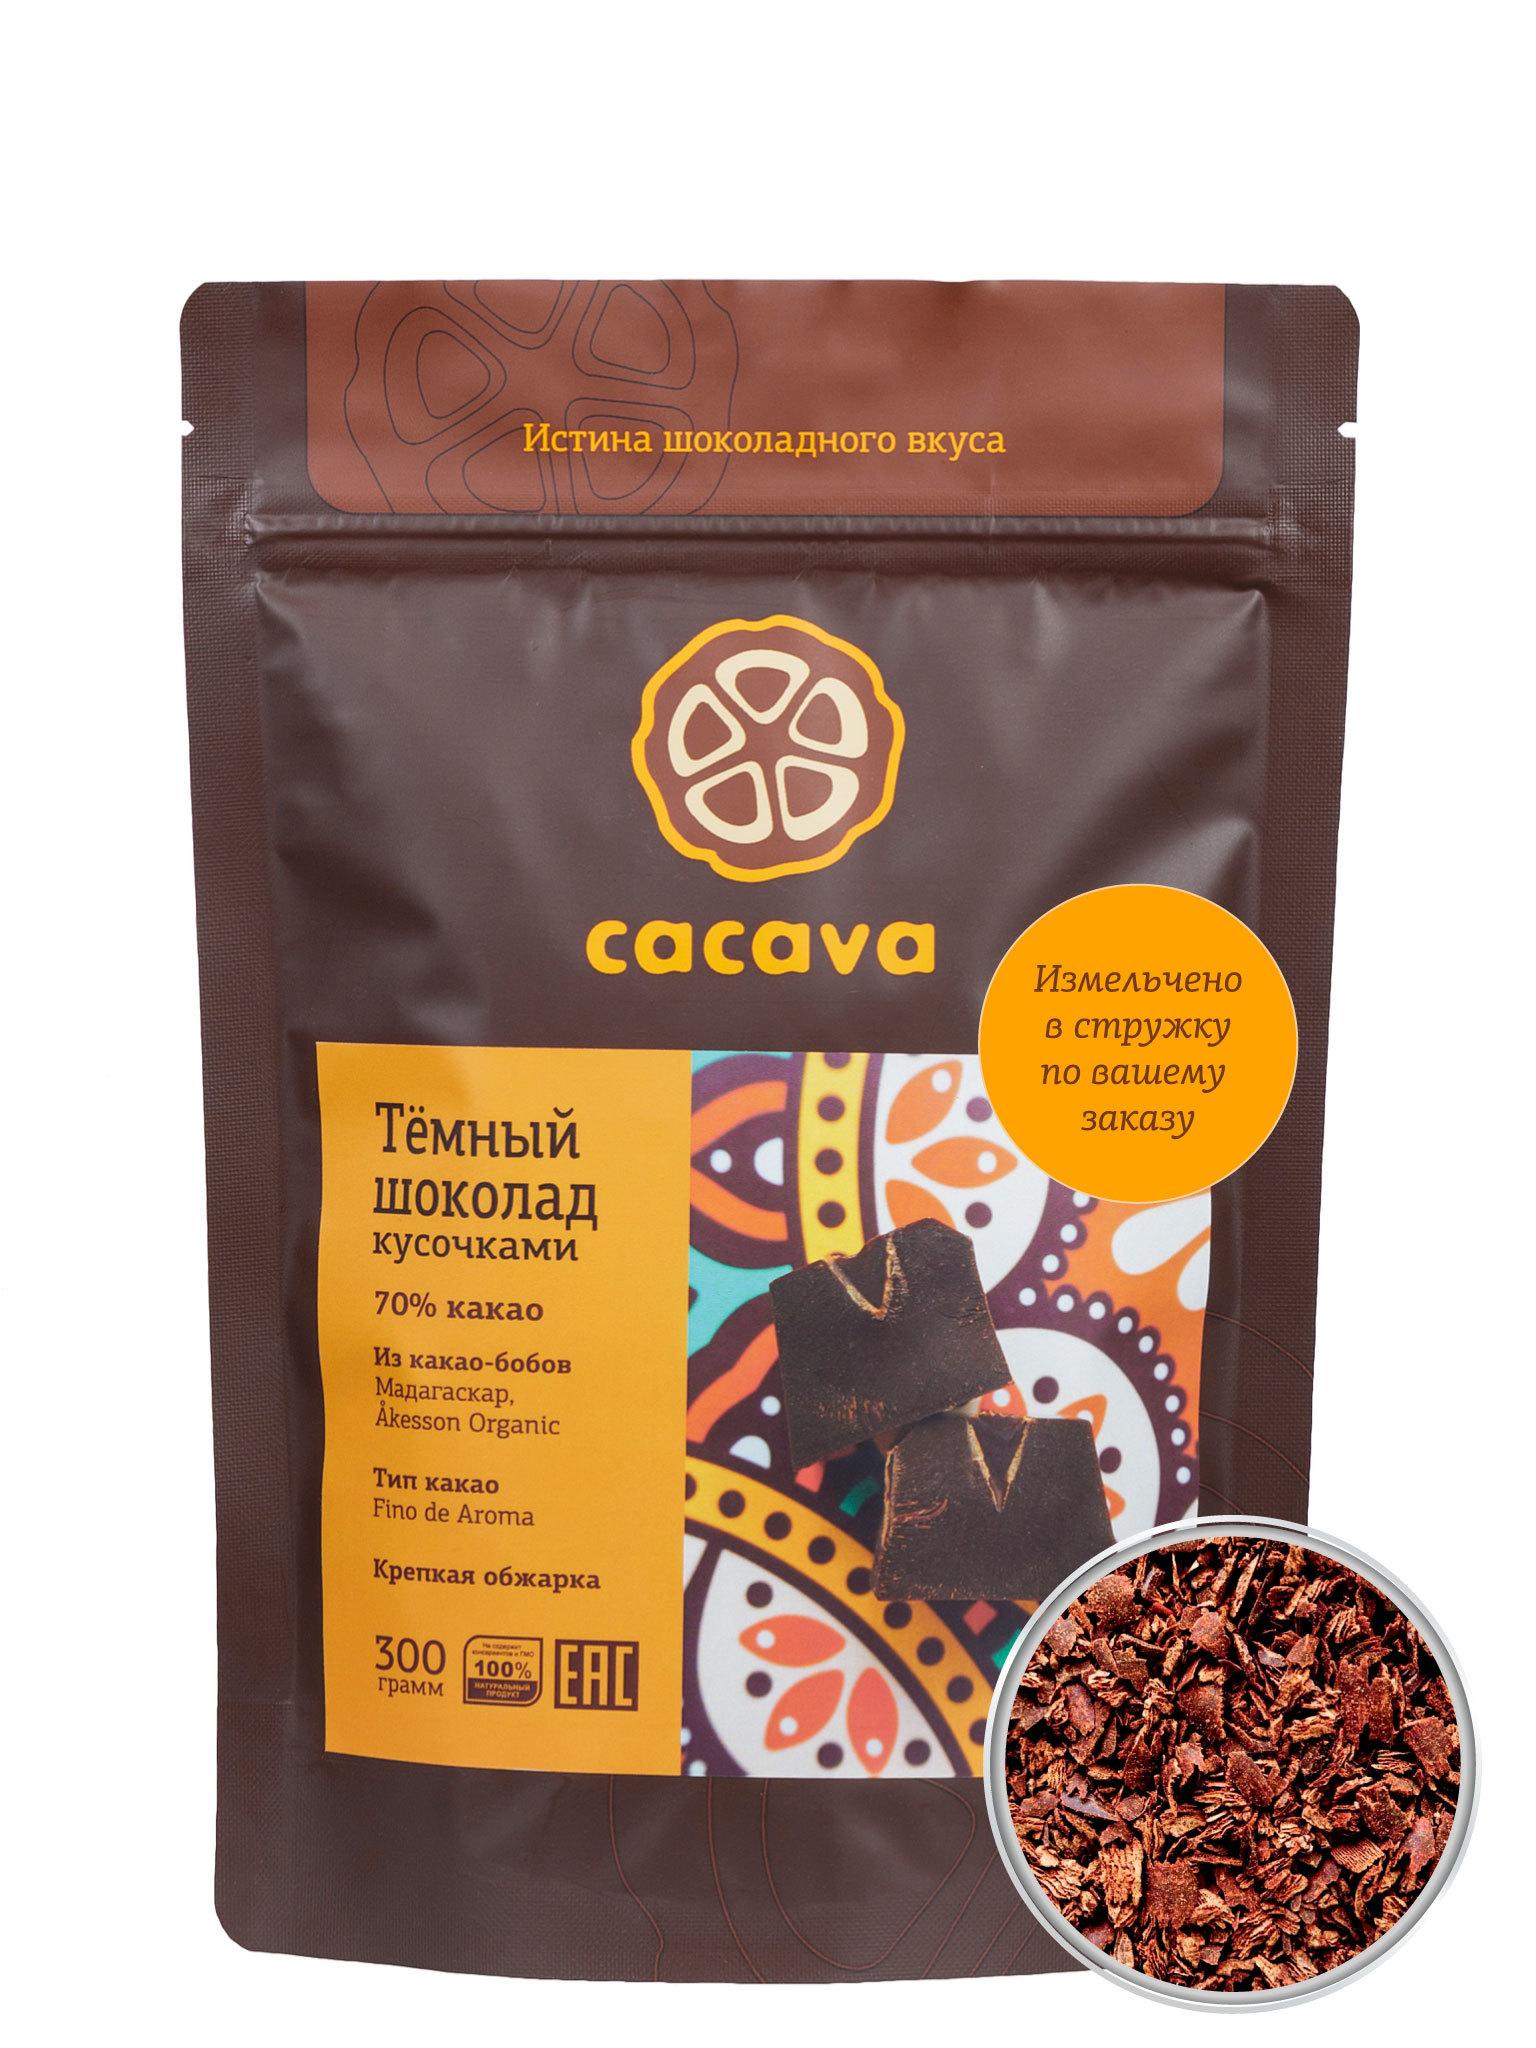 Тёмный шоколад 70 % какао в стружке (Мадагаскар, Åkesson), упаковка 300 грамм